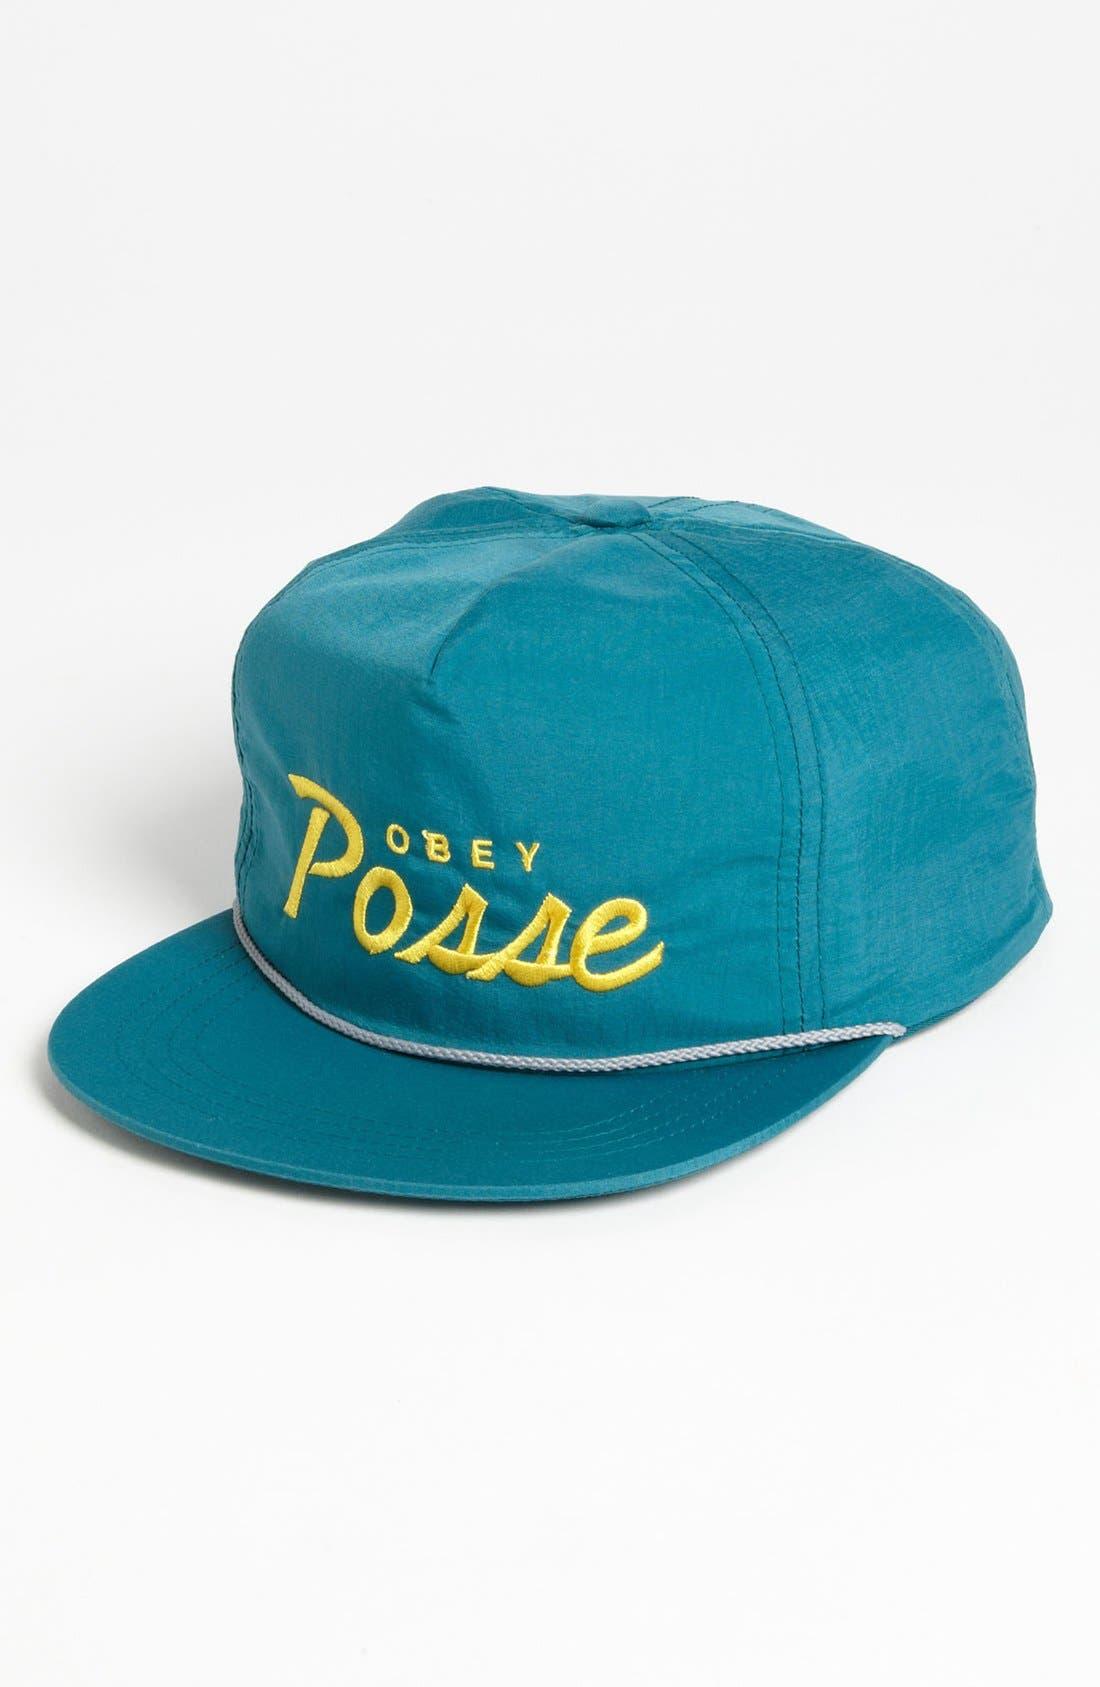 Alternate Image 1 Selected - Obey 'Posse' Snapback Hat